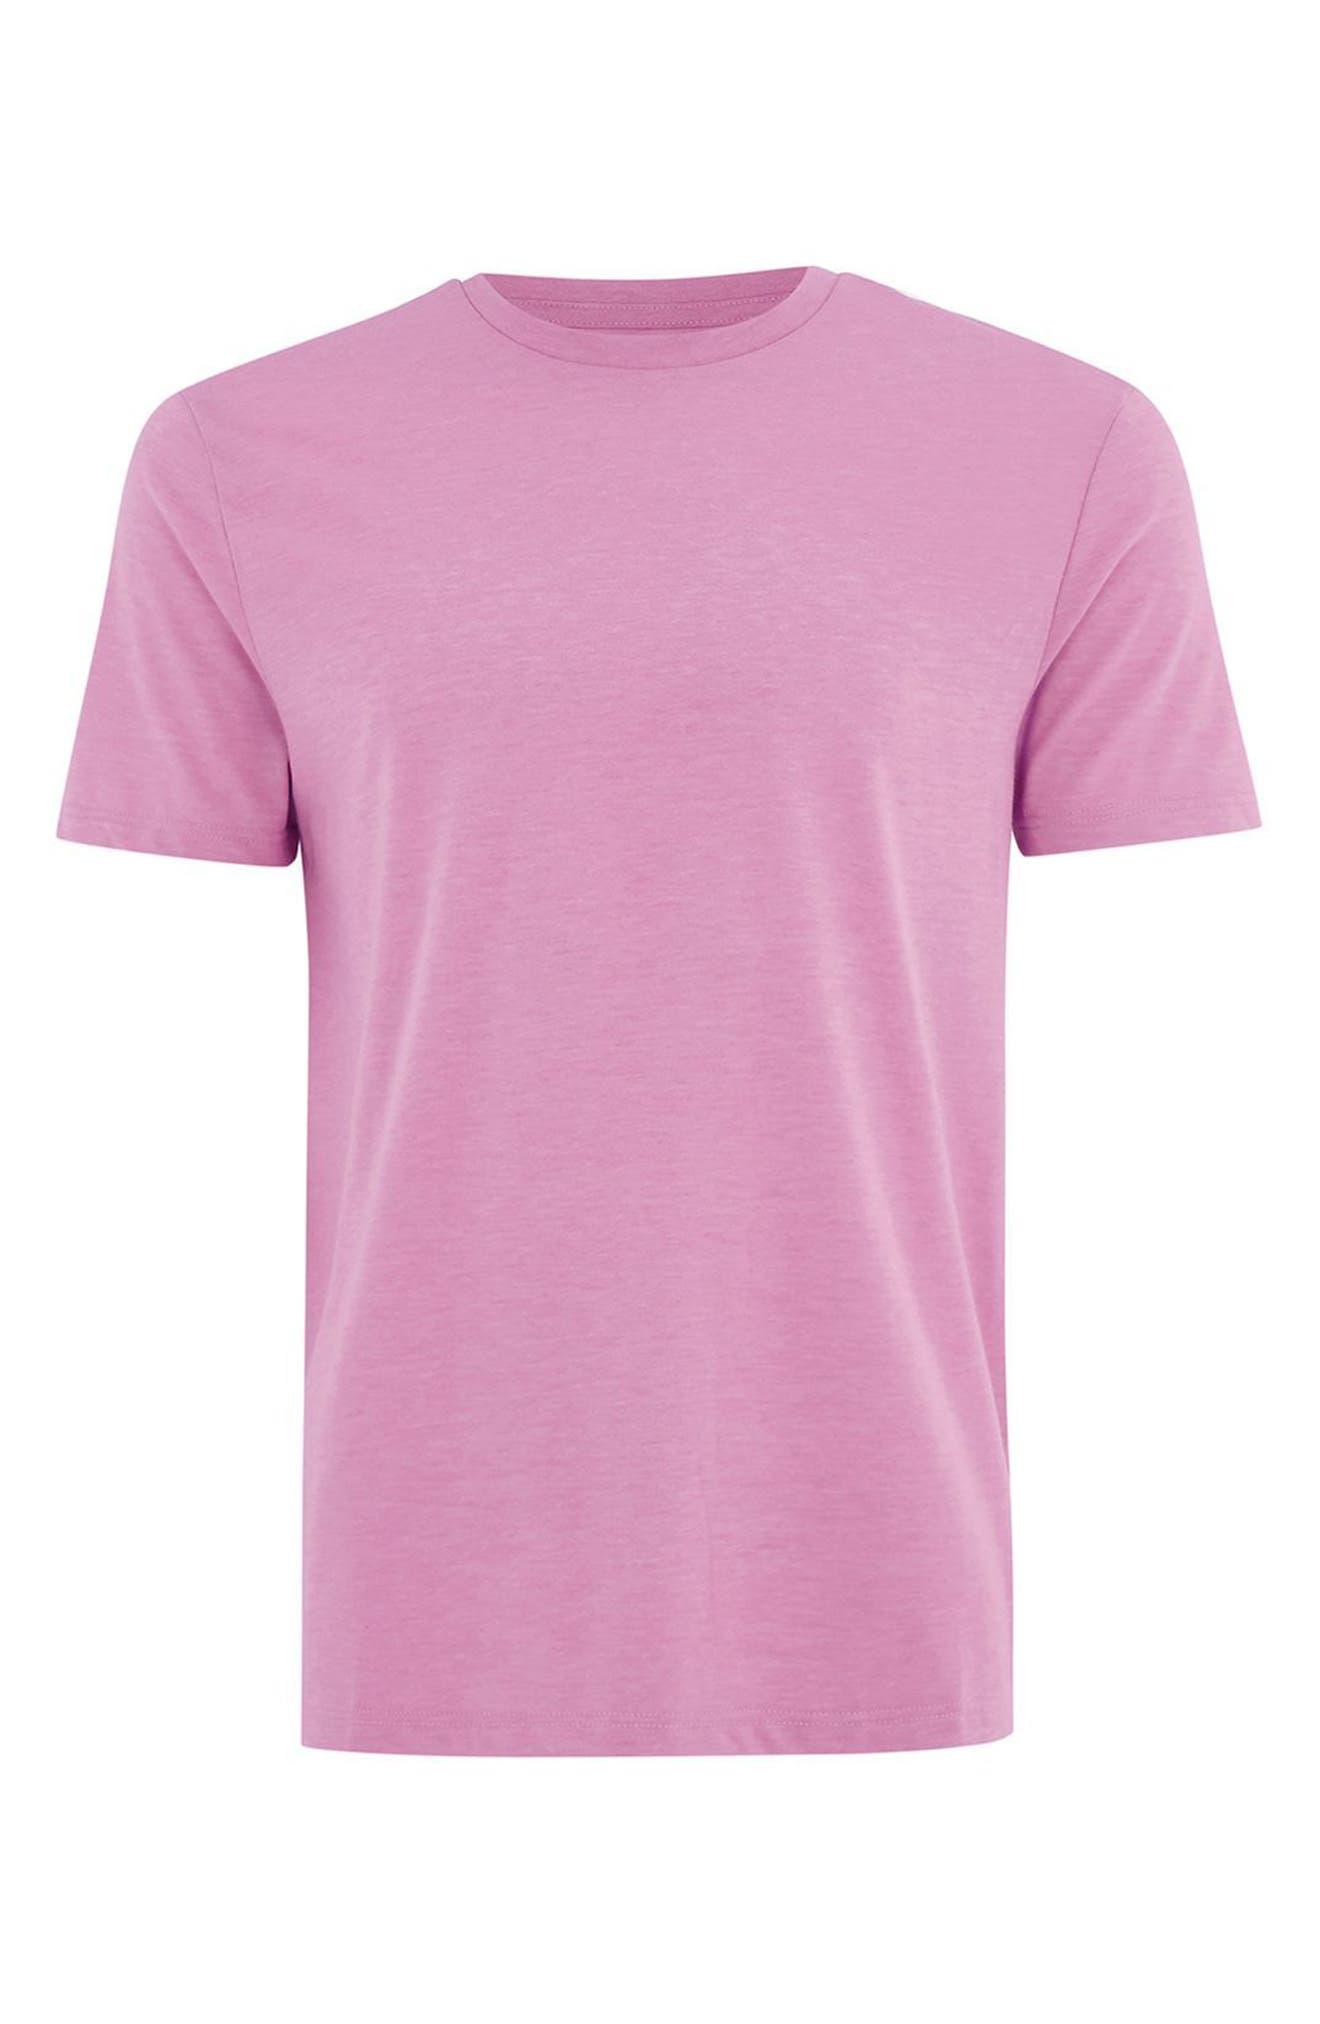 Slim Fit Crewneck T-Shirt,                             Alternate thumbnail 304, color,